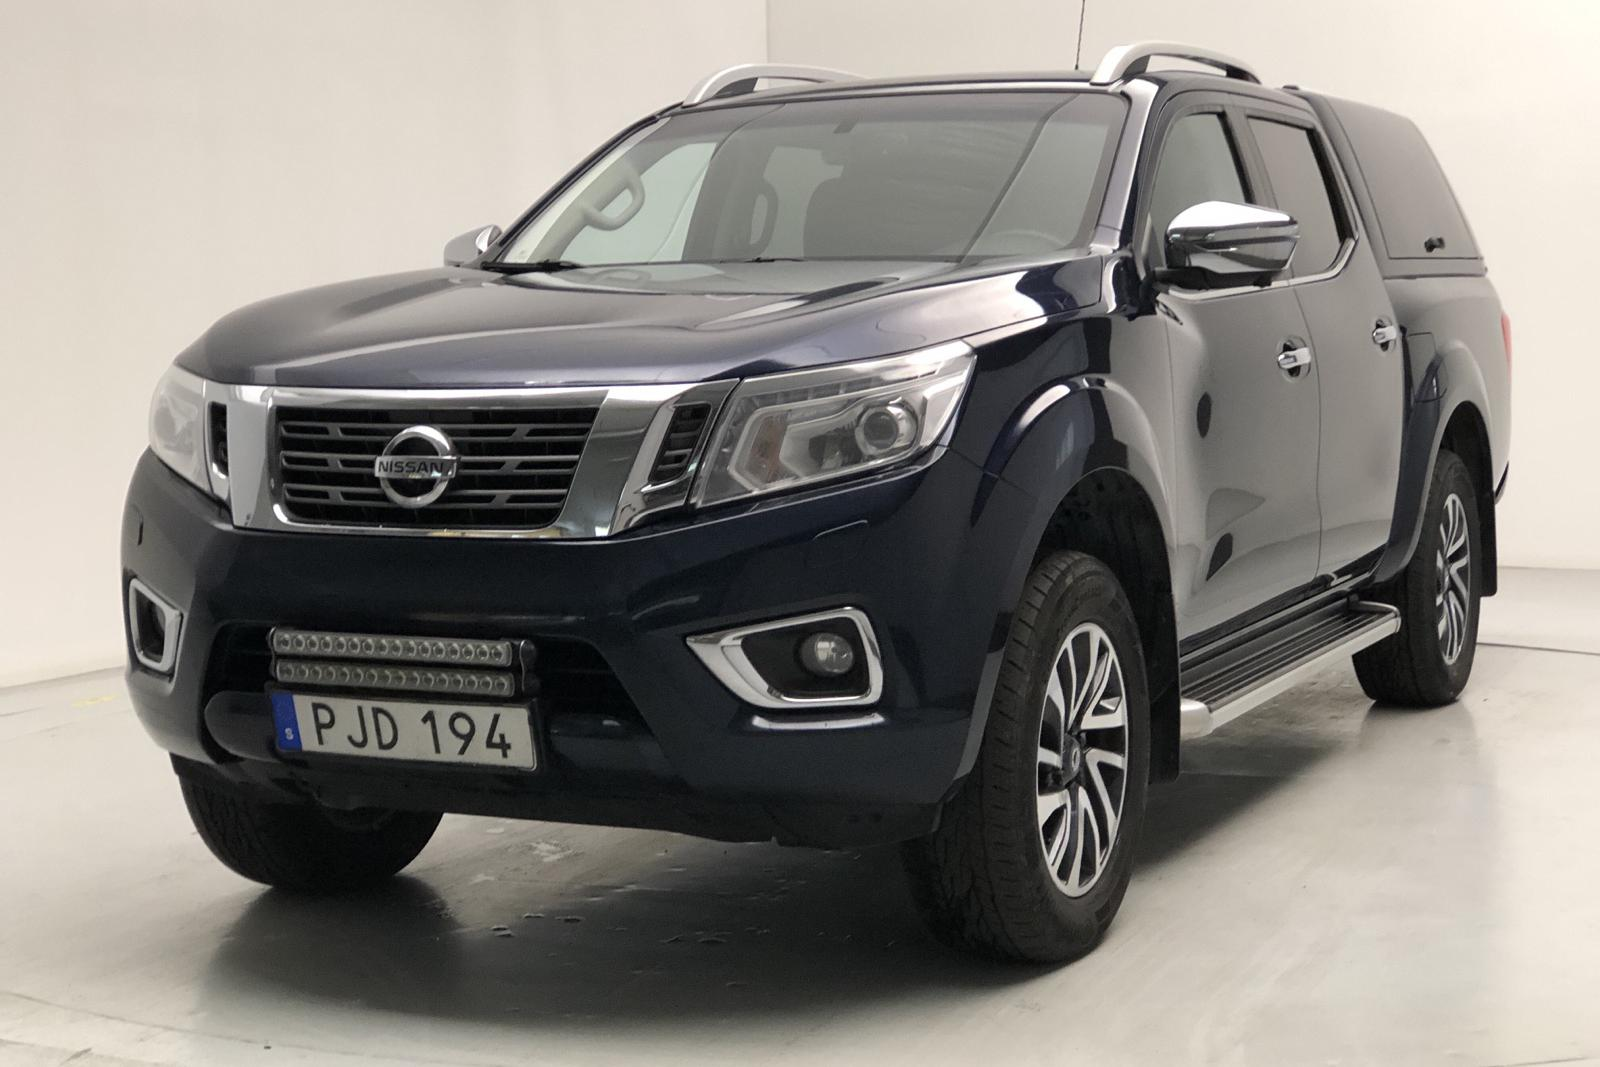 Nissan Navara 2.3 dCi 4x4 (190hk) - 145 000 km - Automatic - Dark Blue - 2017